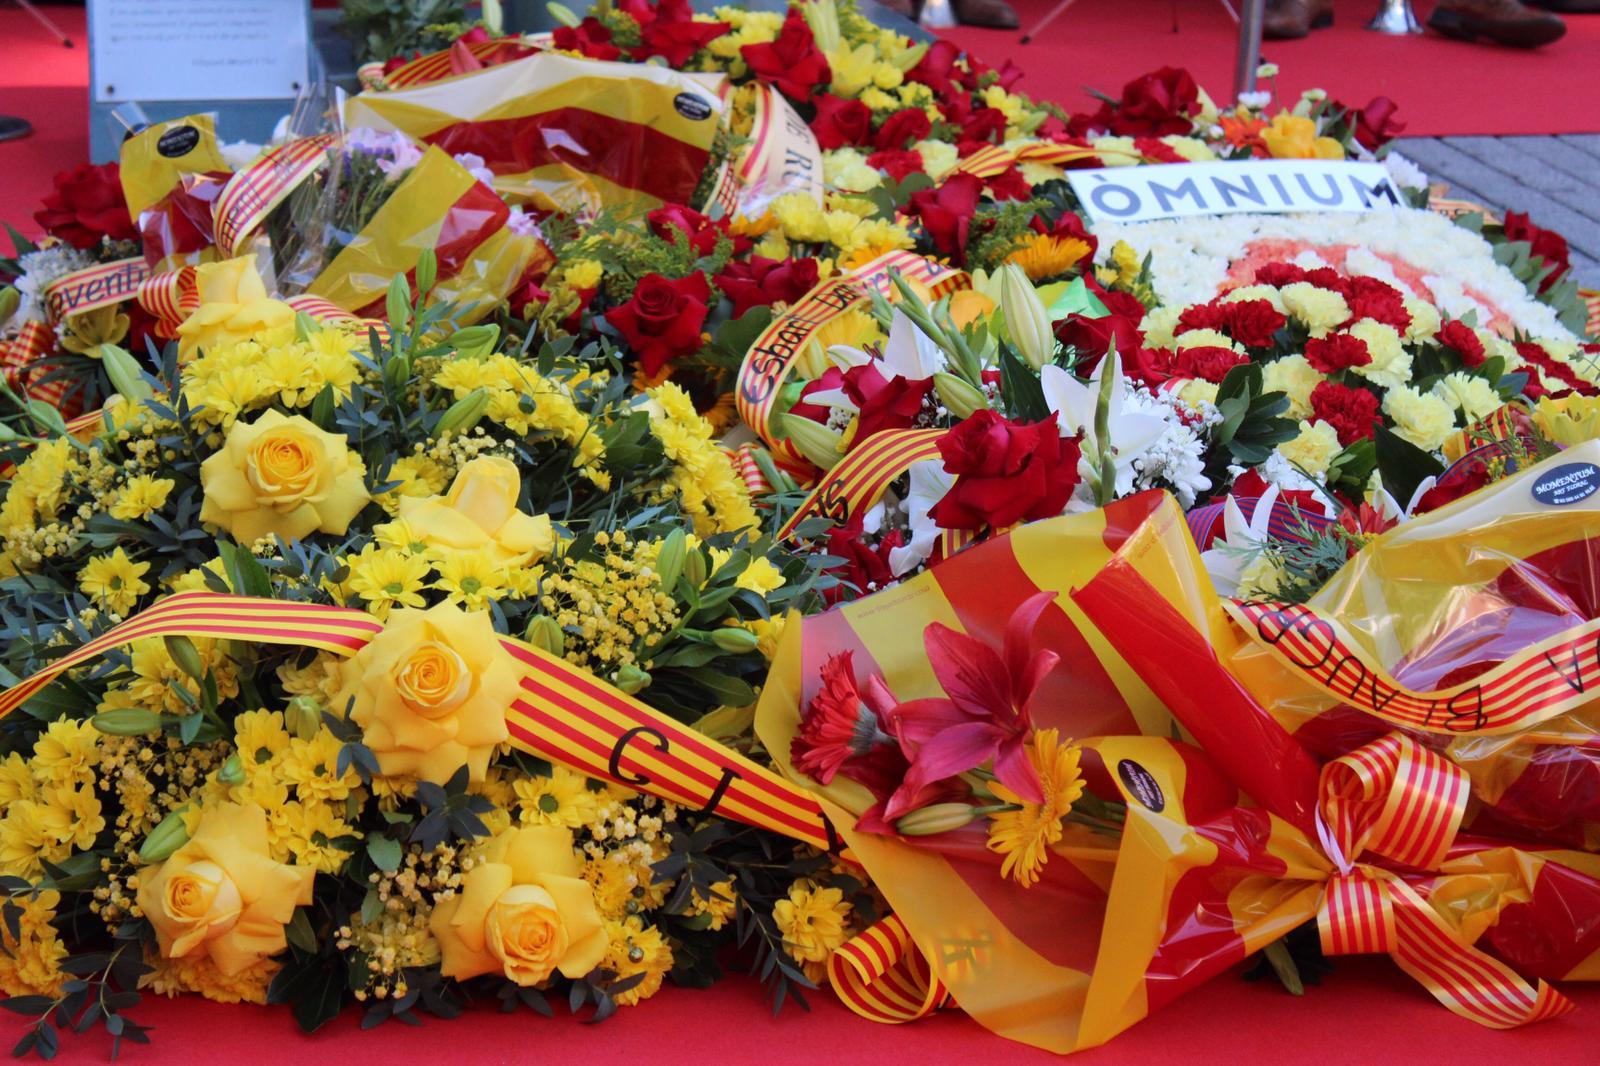 Ofrena floral a la plaça Onze de Setembre. FOTO: Andrea Martínez